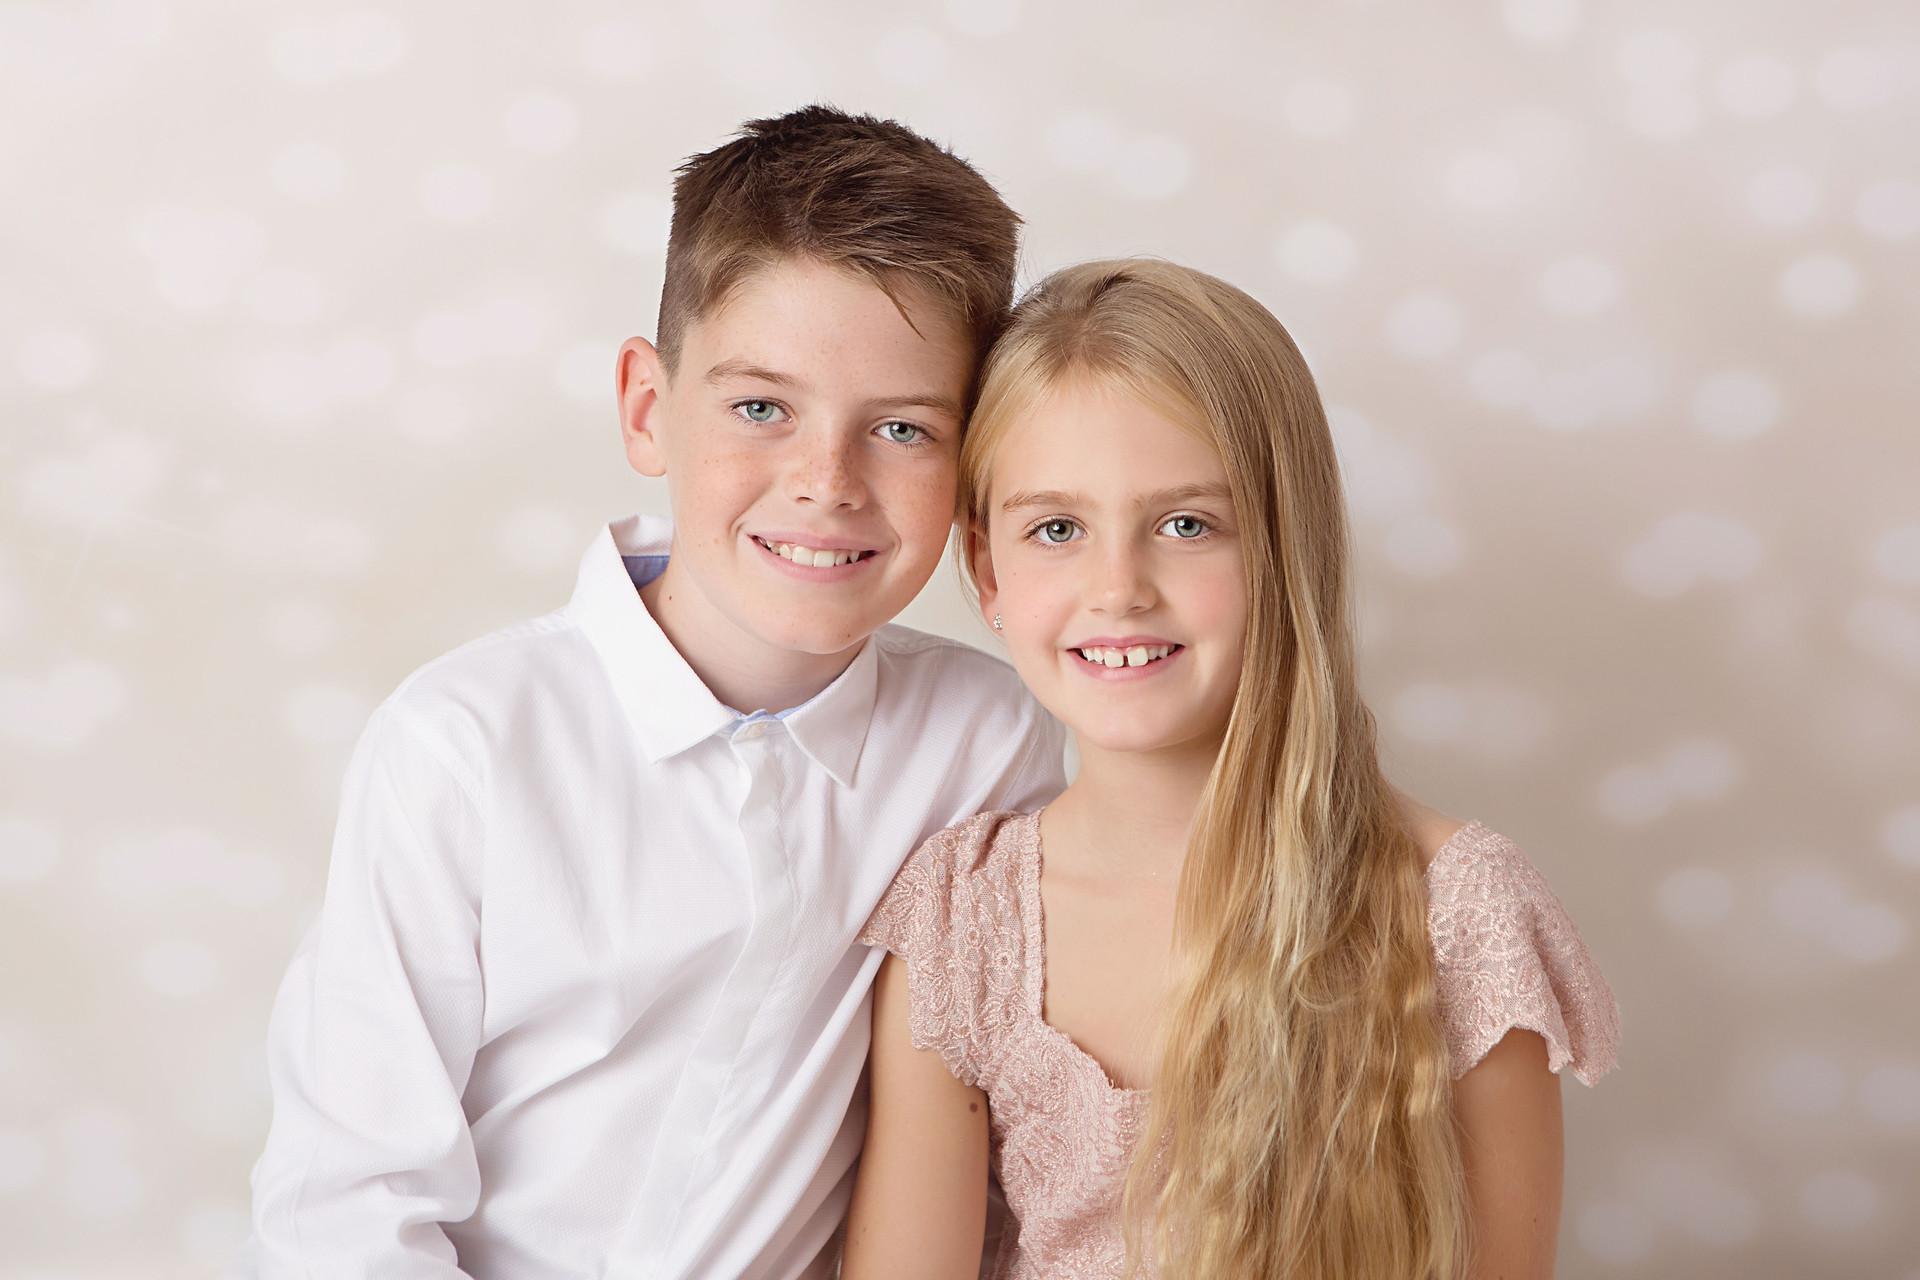 Kids photograph Yanchep Perth